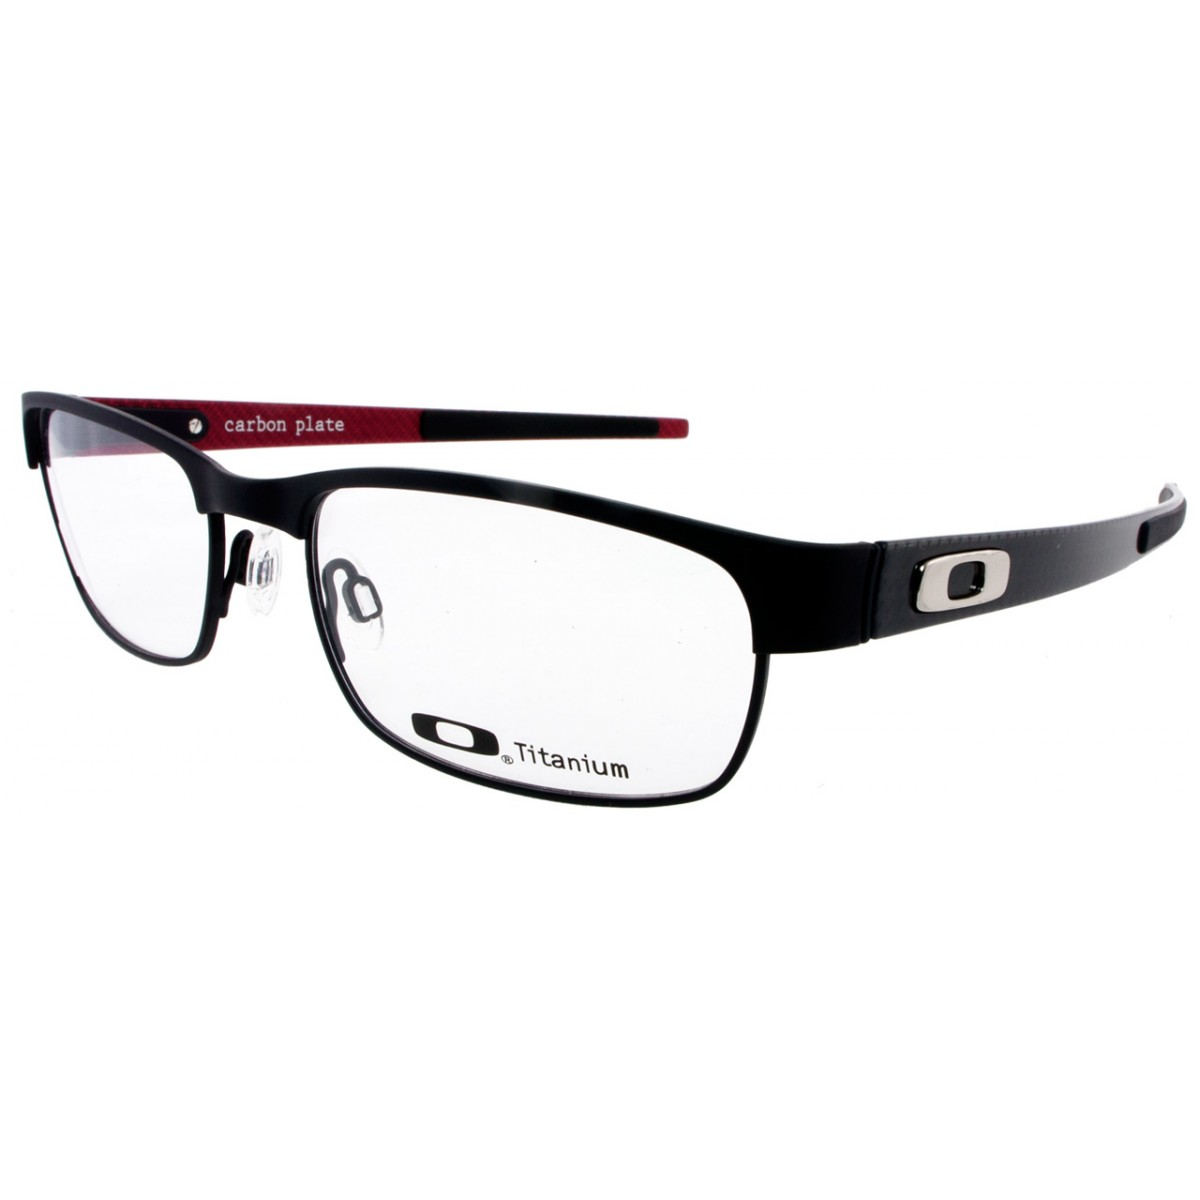 e46594d1d39 Online Eyeglasses with Customer Service Center in California Oakley ...